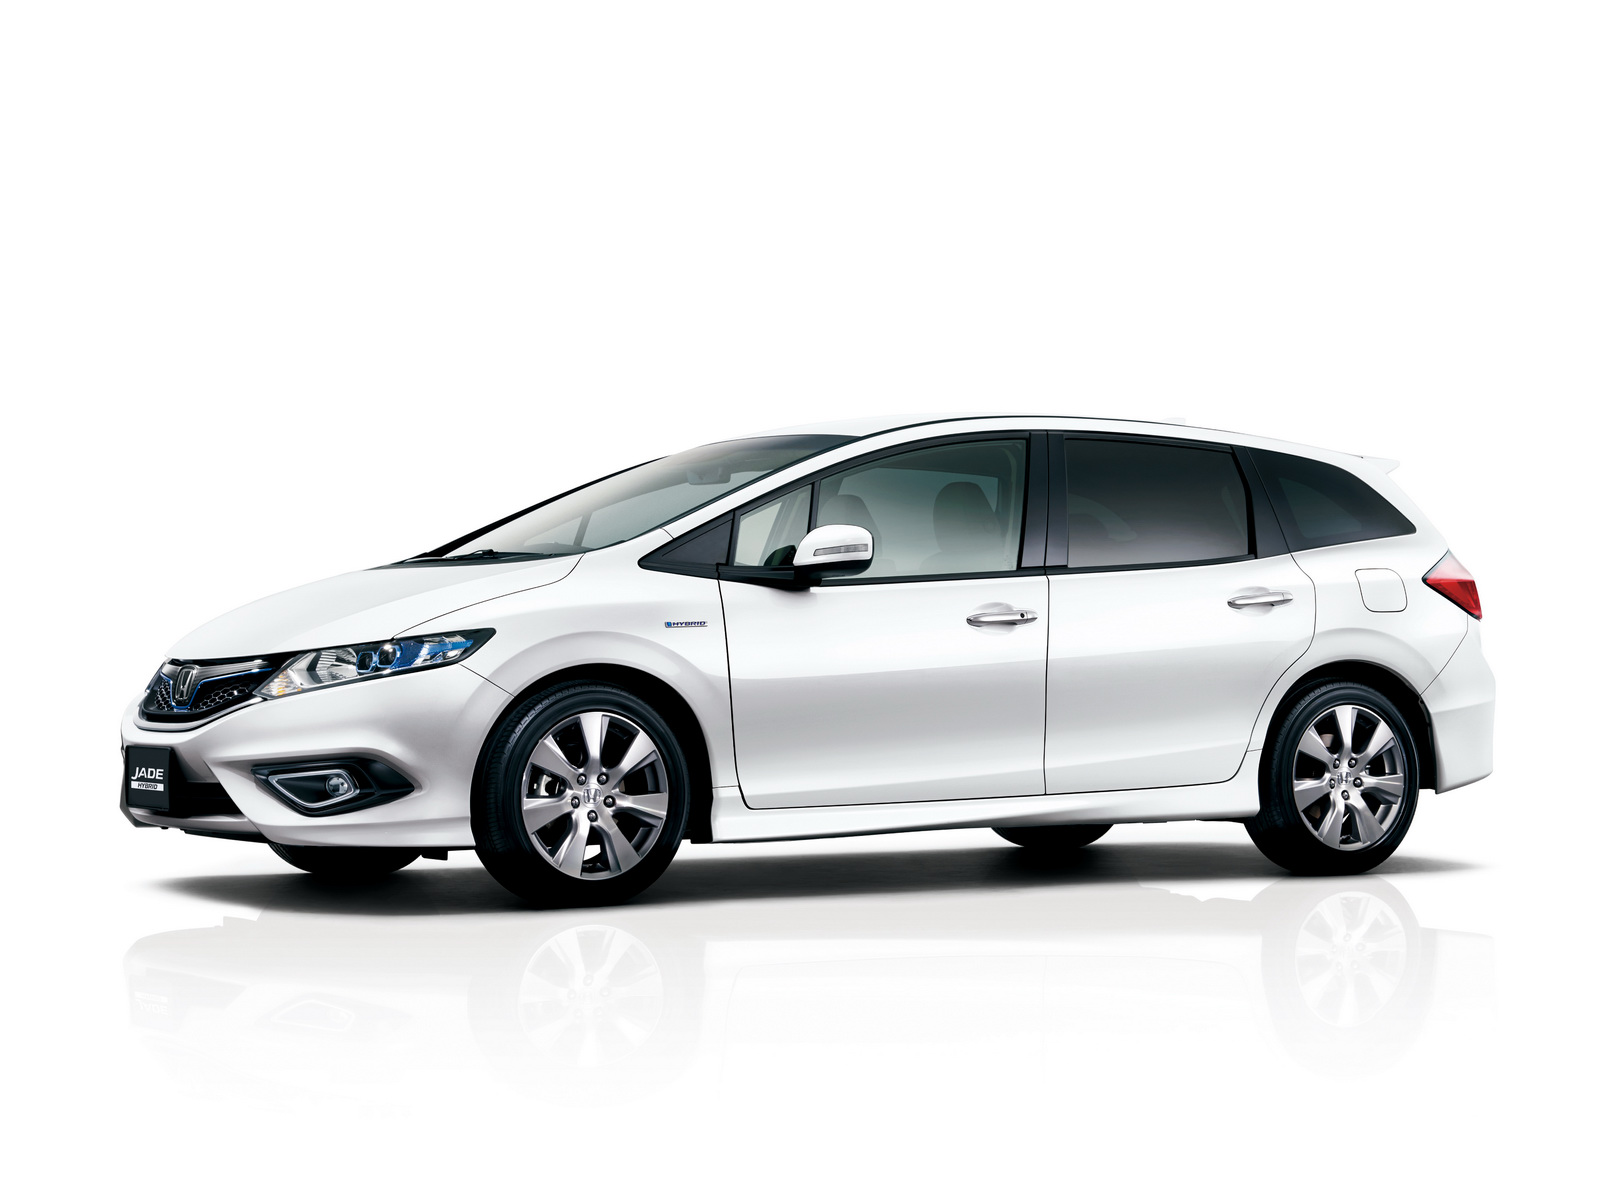 2013 - Honda Jade - Page 2